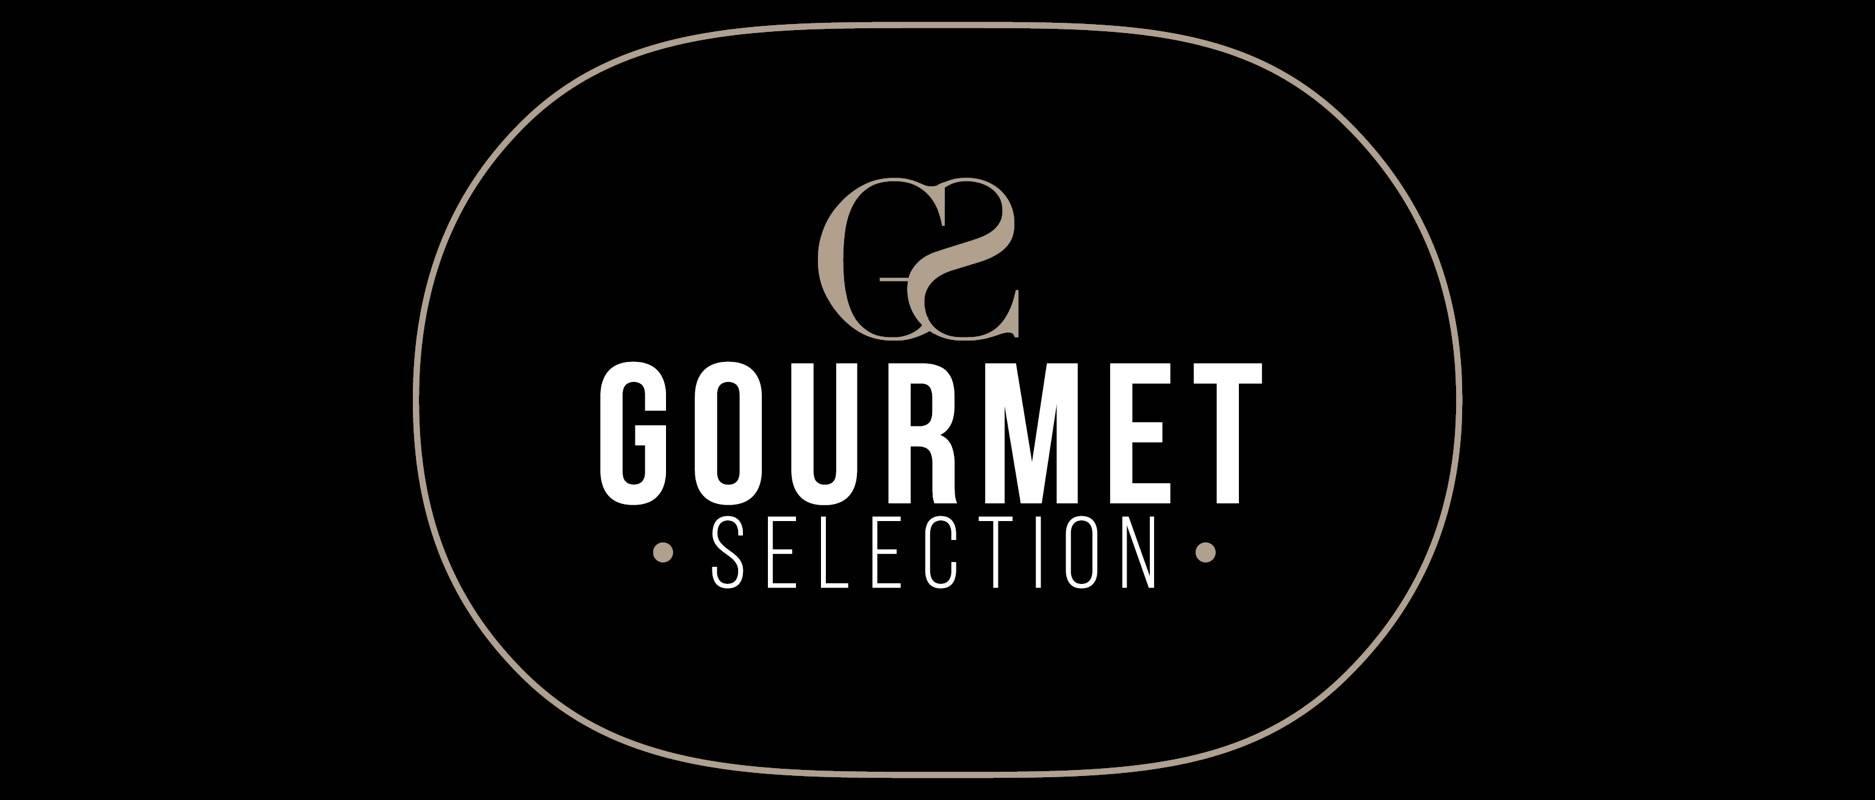 Gourmet selection logo